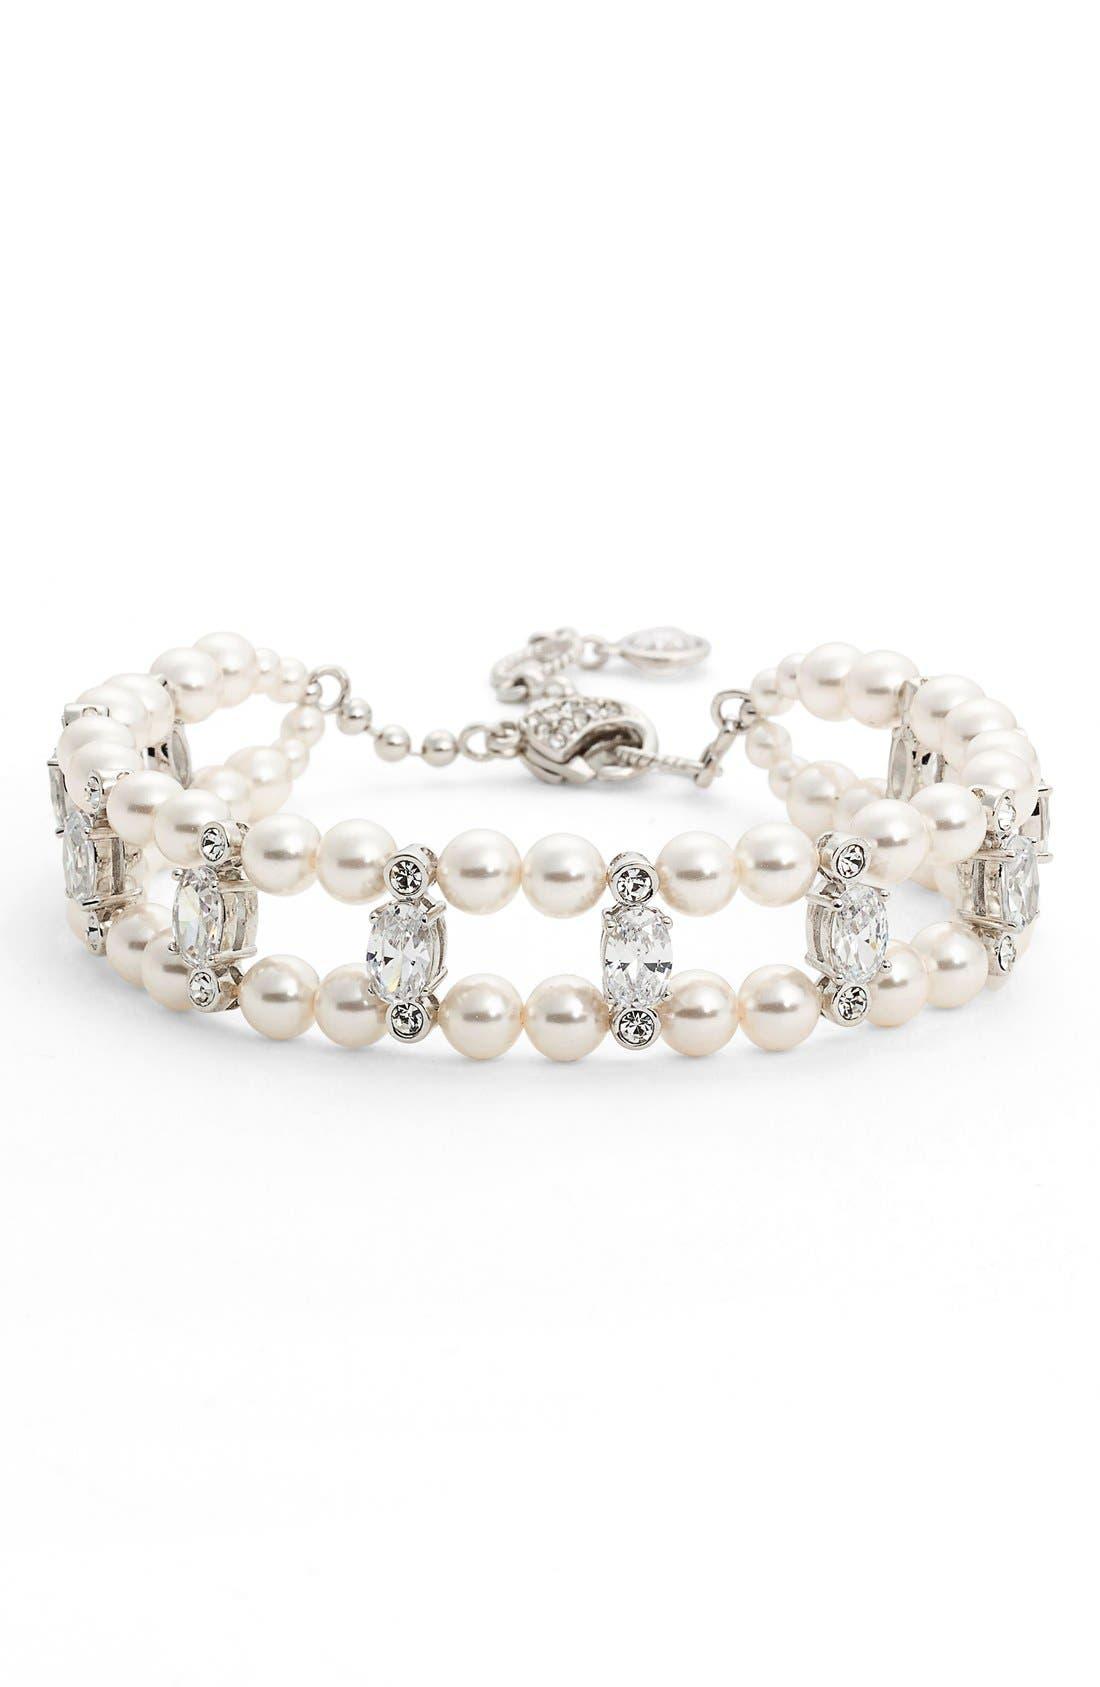 Double Row Imitation Pearl & Crystal Bracelet,                             Main thumbnail 1, color,                             IVORY